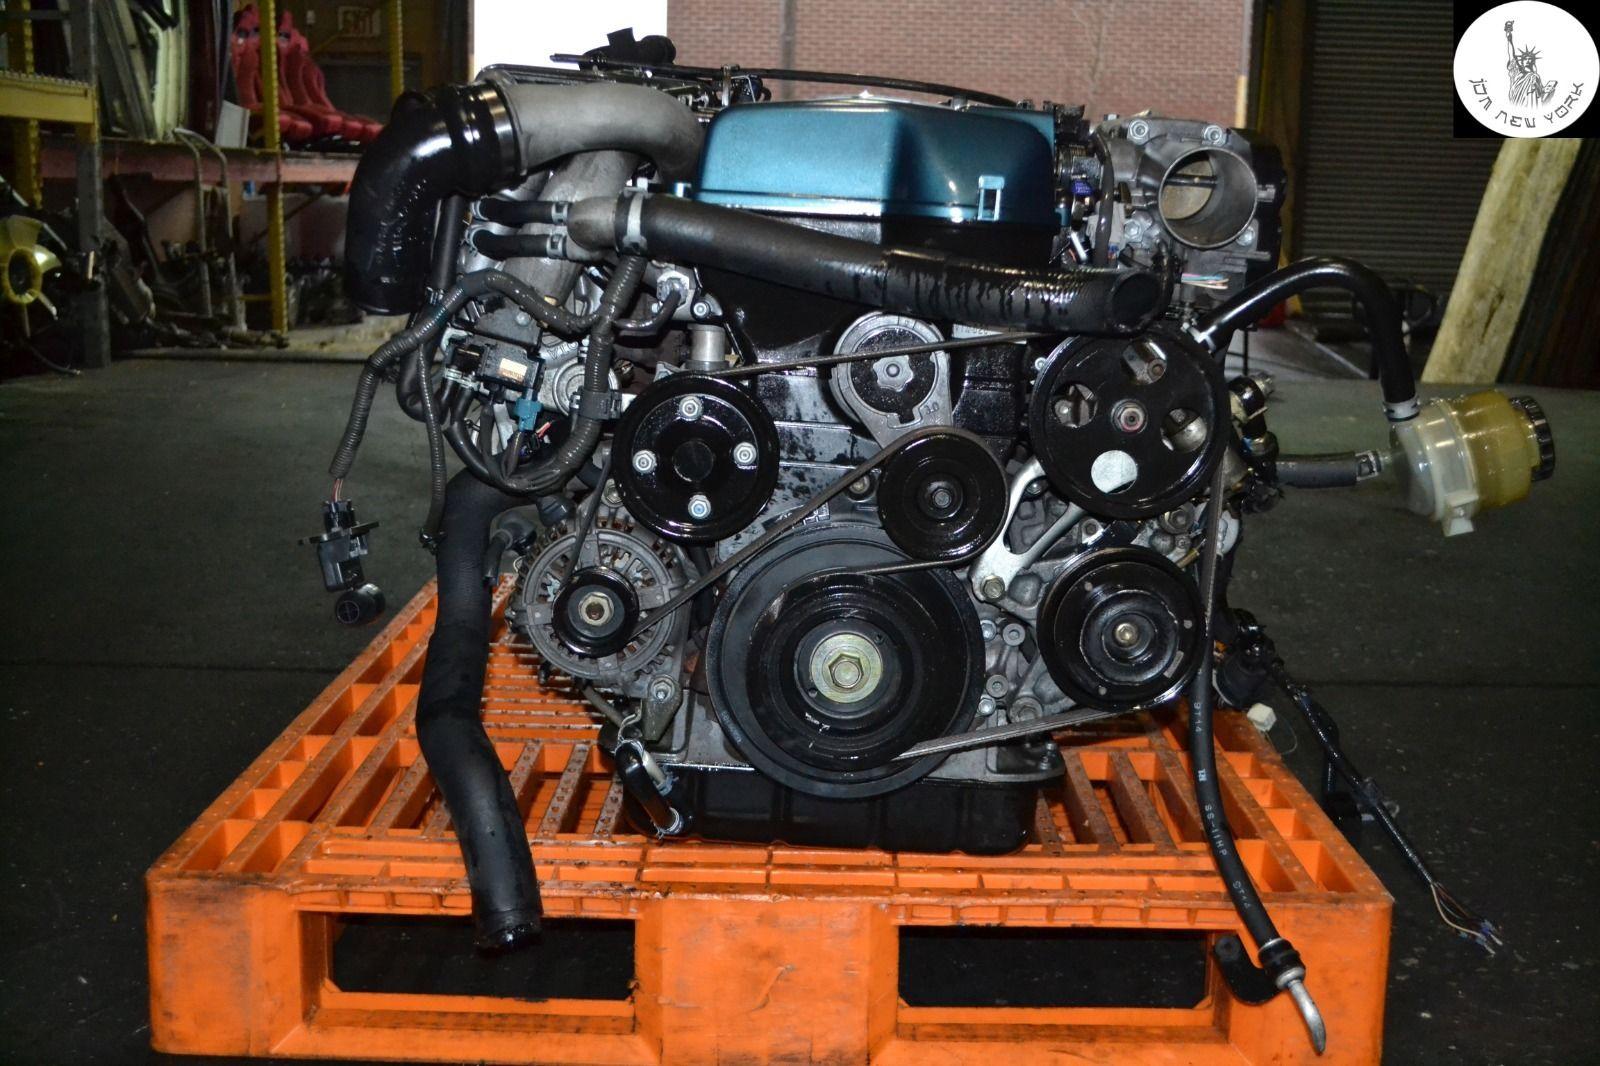 TOYOTA ARISTO JZS161 TWIN TURBO VVT-i ENGINE AUTO TRANS ...